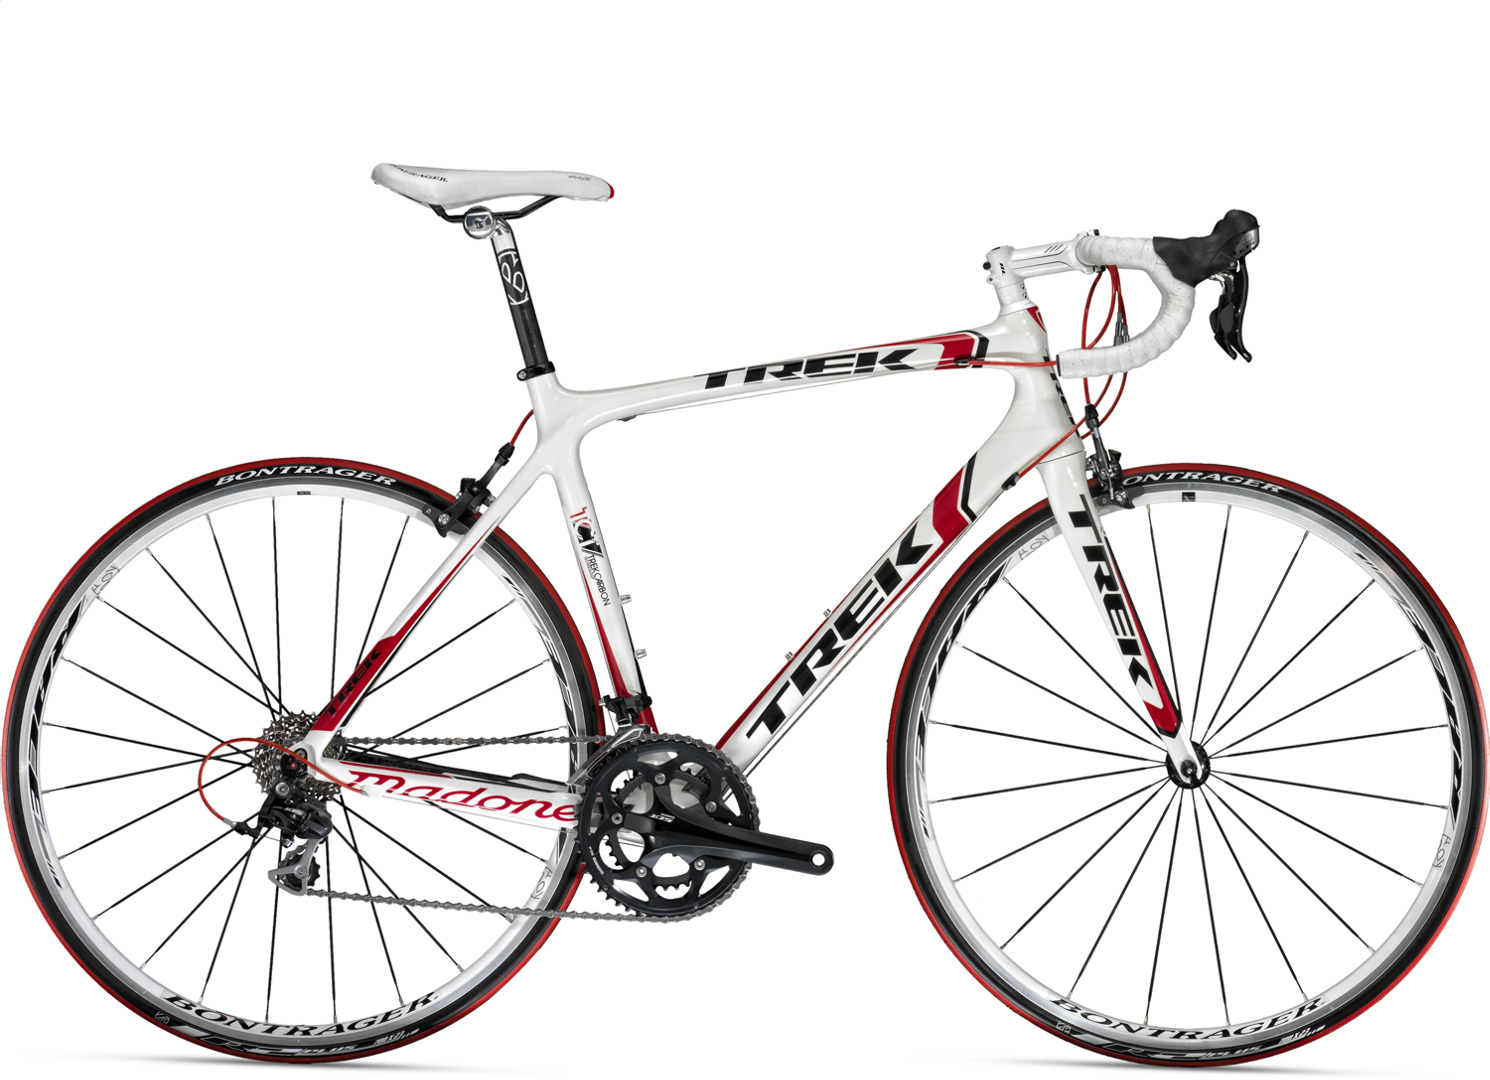 Cool Trek Bike Probably Won T Drop 3 049 99 On A Bike Ever